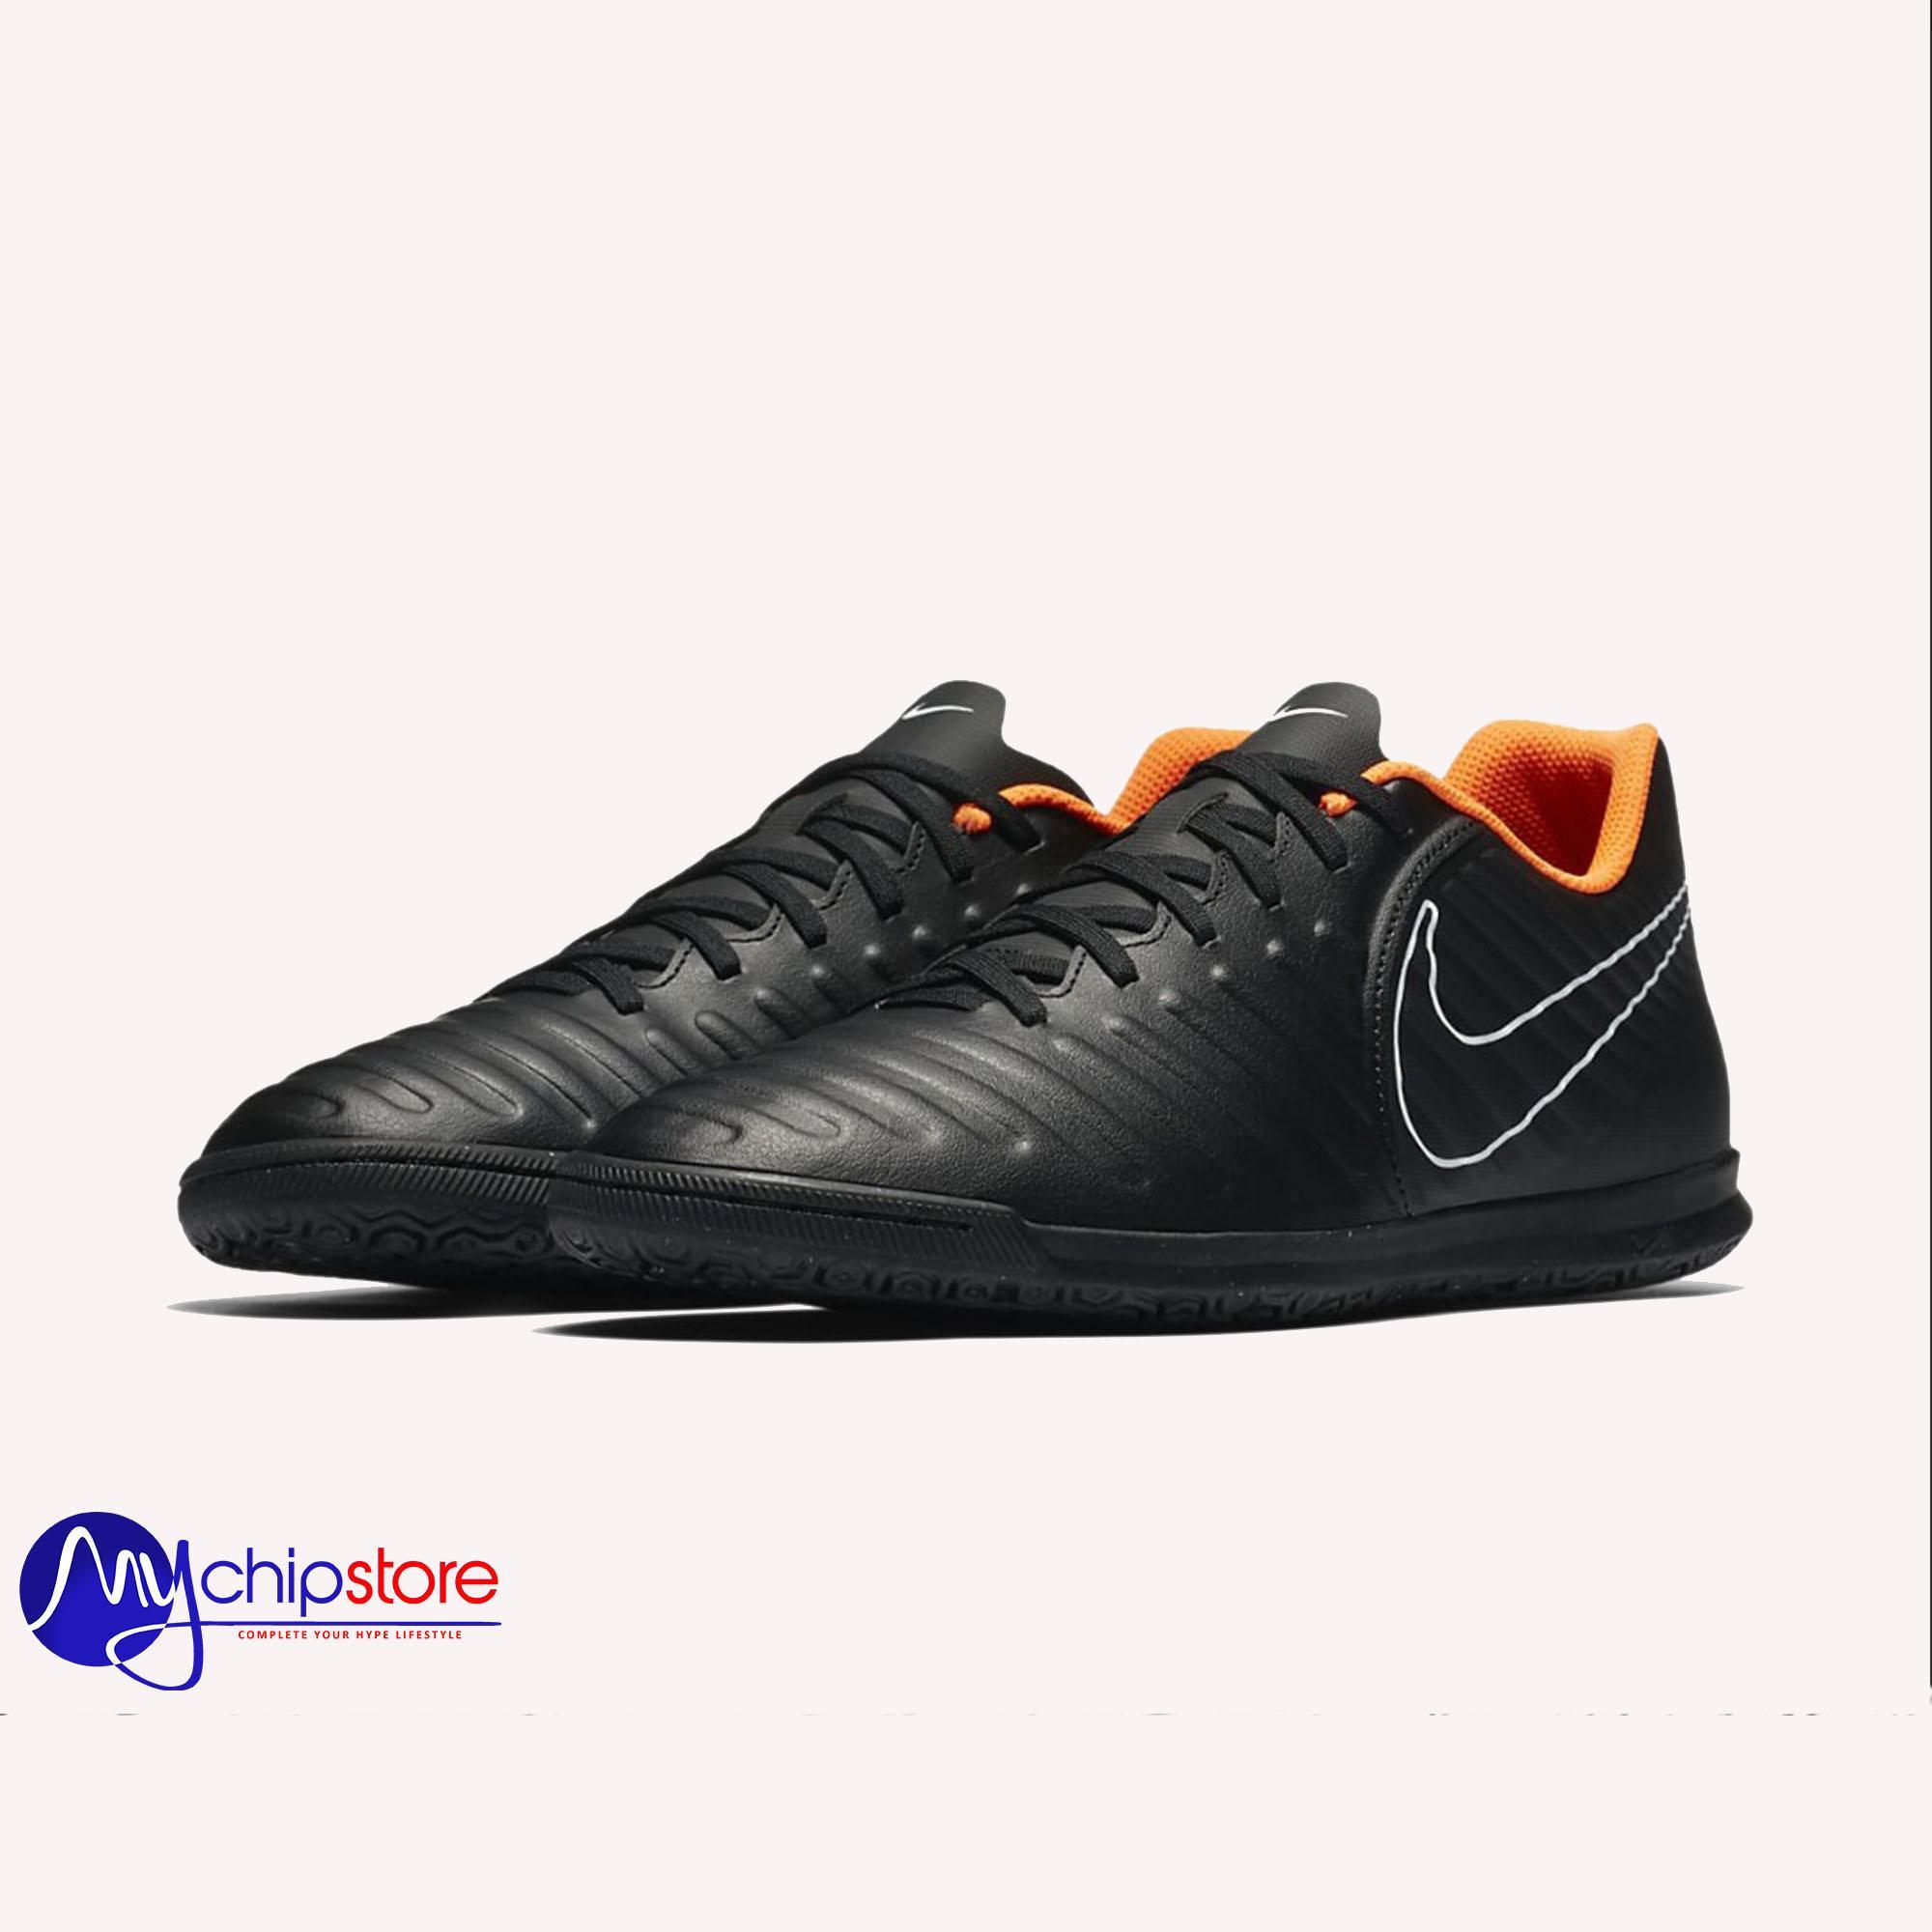 4632a5c4aac7e Jual Sepatu Futsal Pria Nike Terbaru | Lazada.co.id